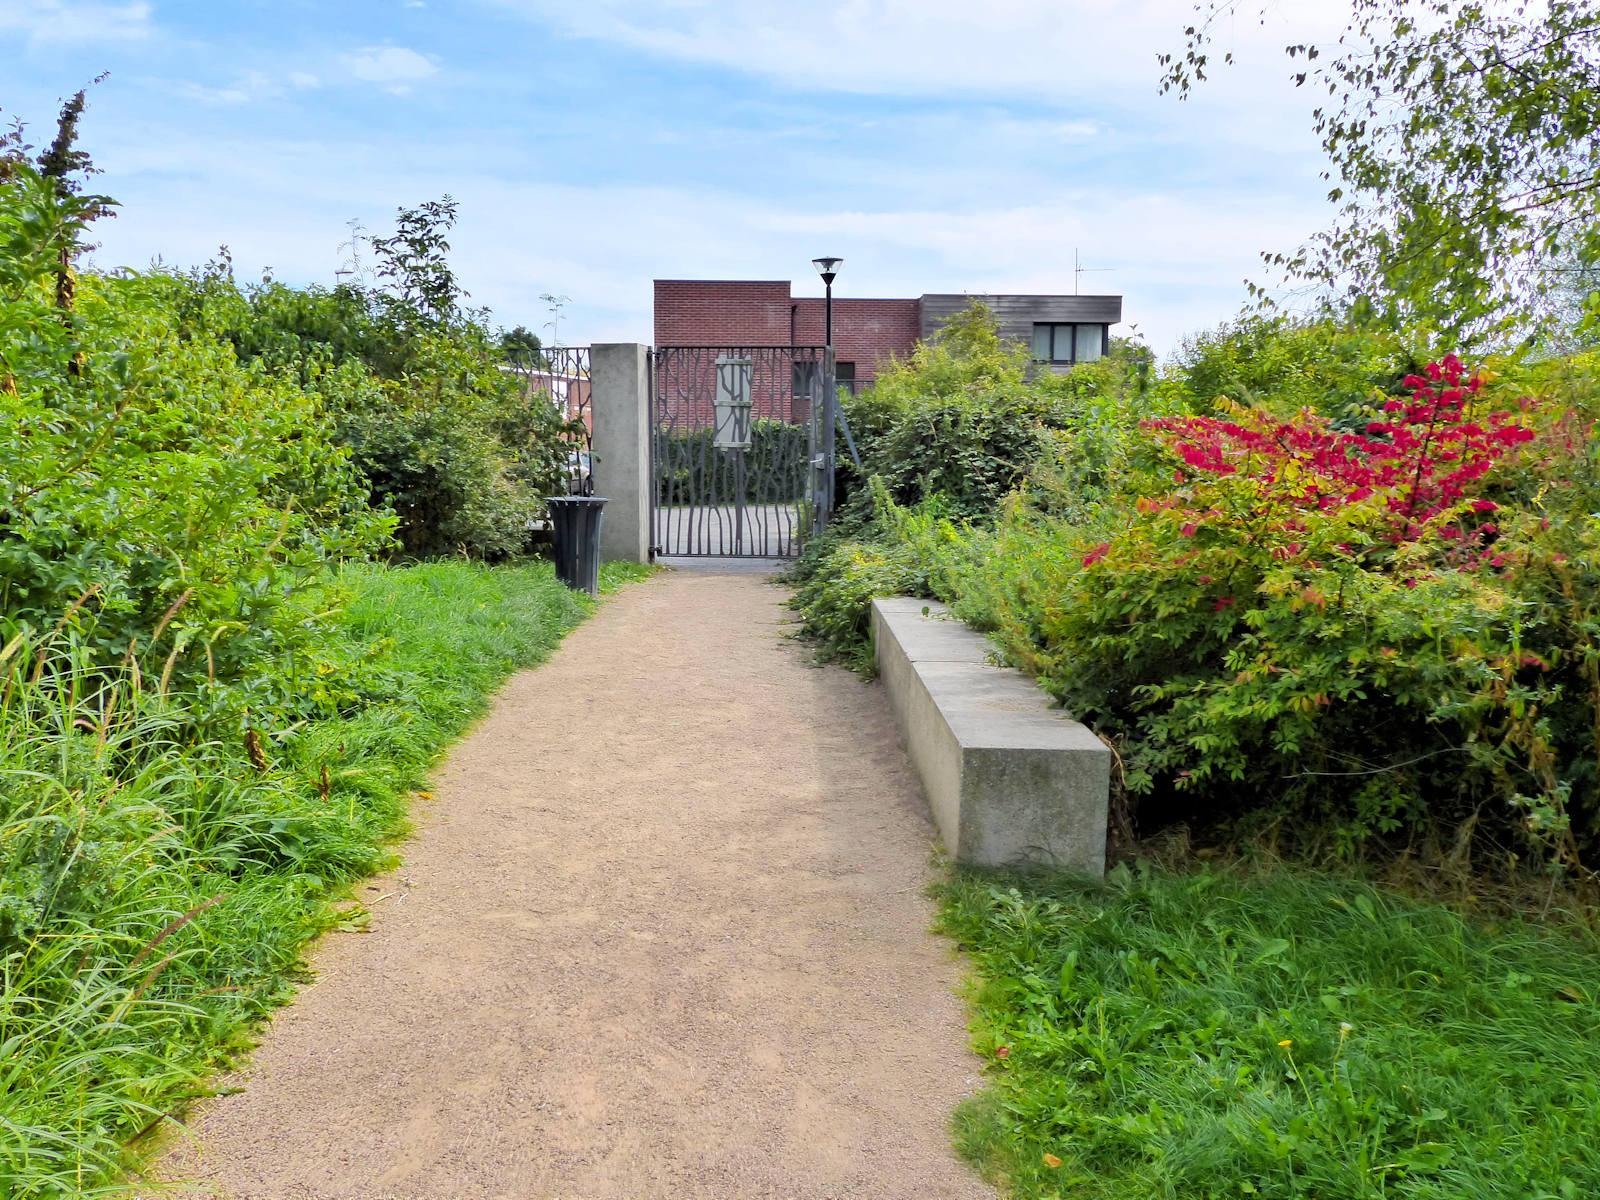 Parc Jean Moulin, Tourcoing